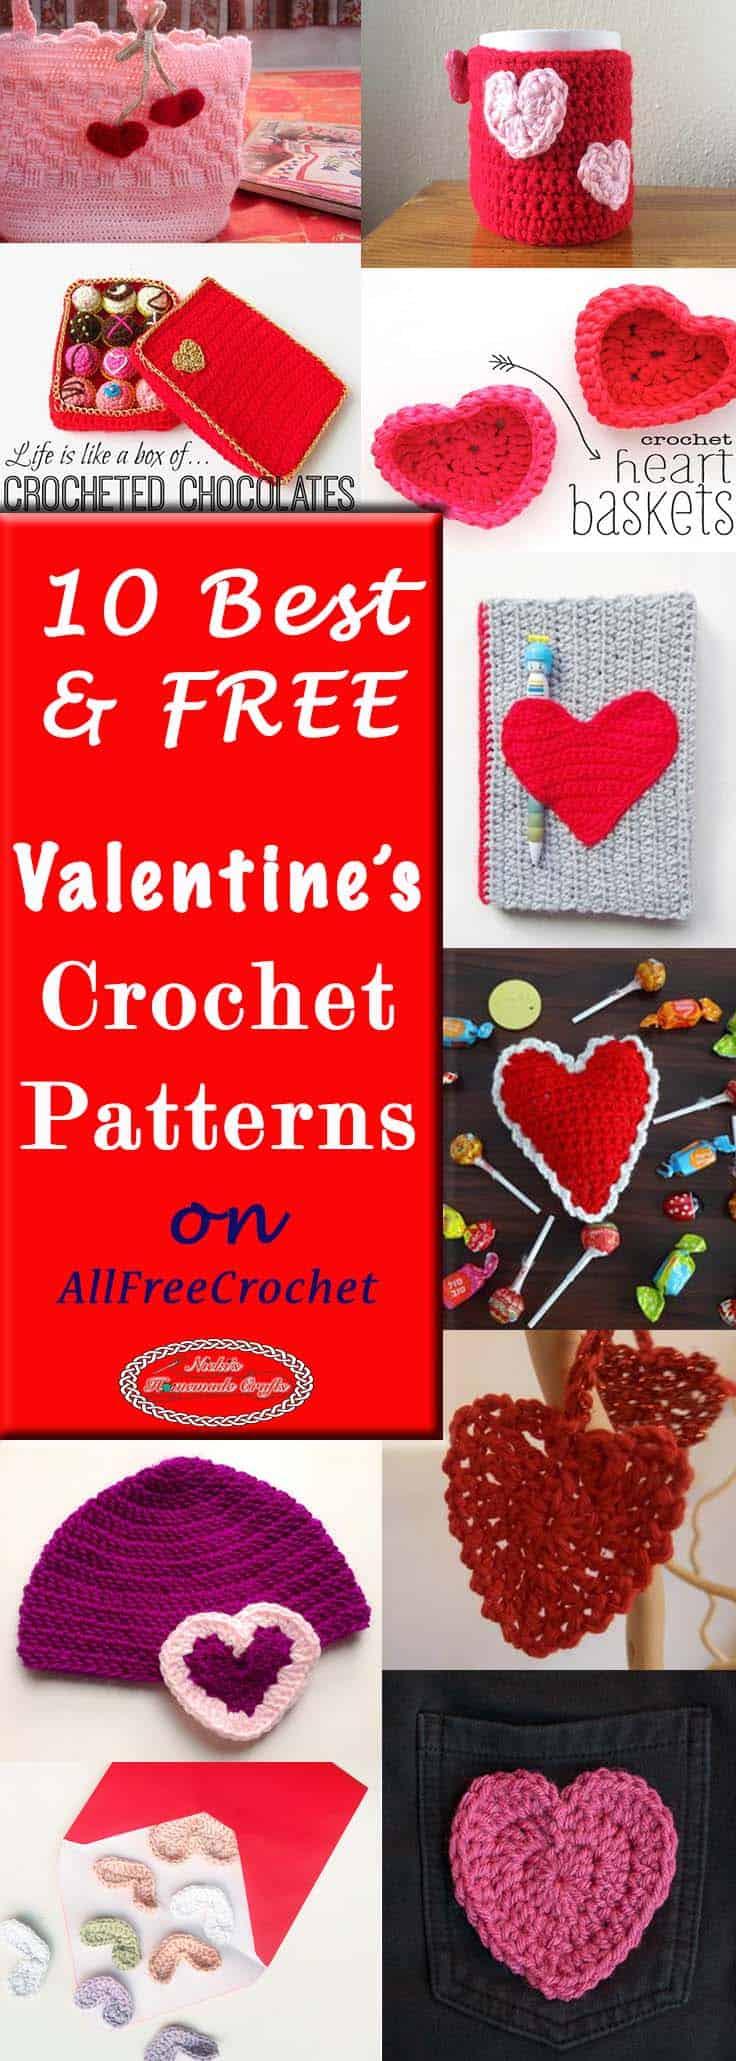 10 Best Free Valentines Crochet Pattern On Allfreecrochet By Nickis  Homemade Crafts Free Crochet